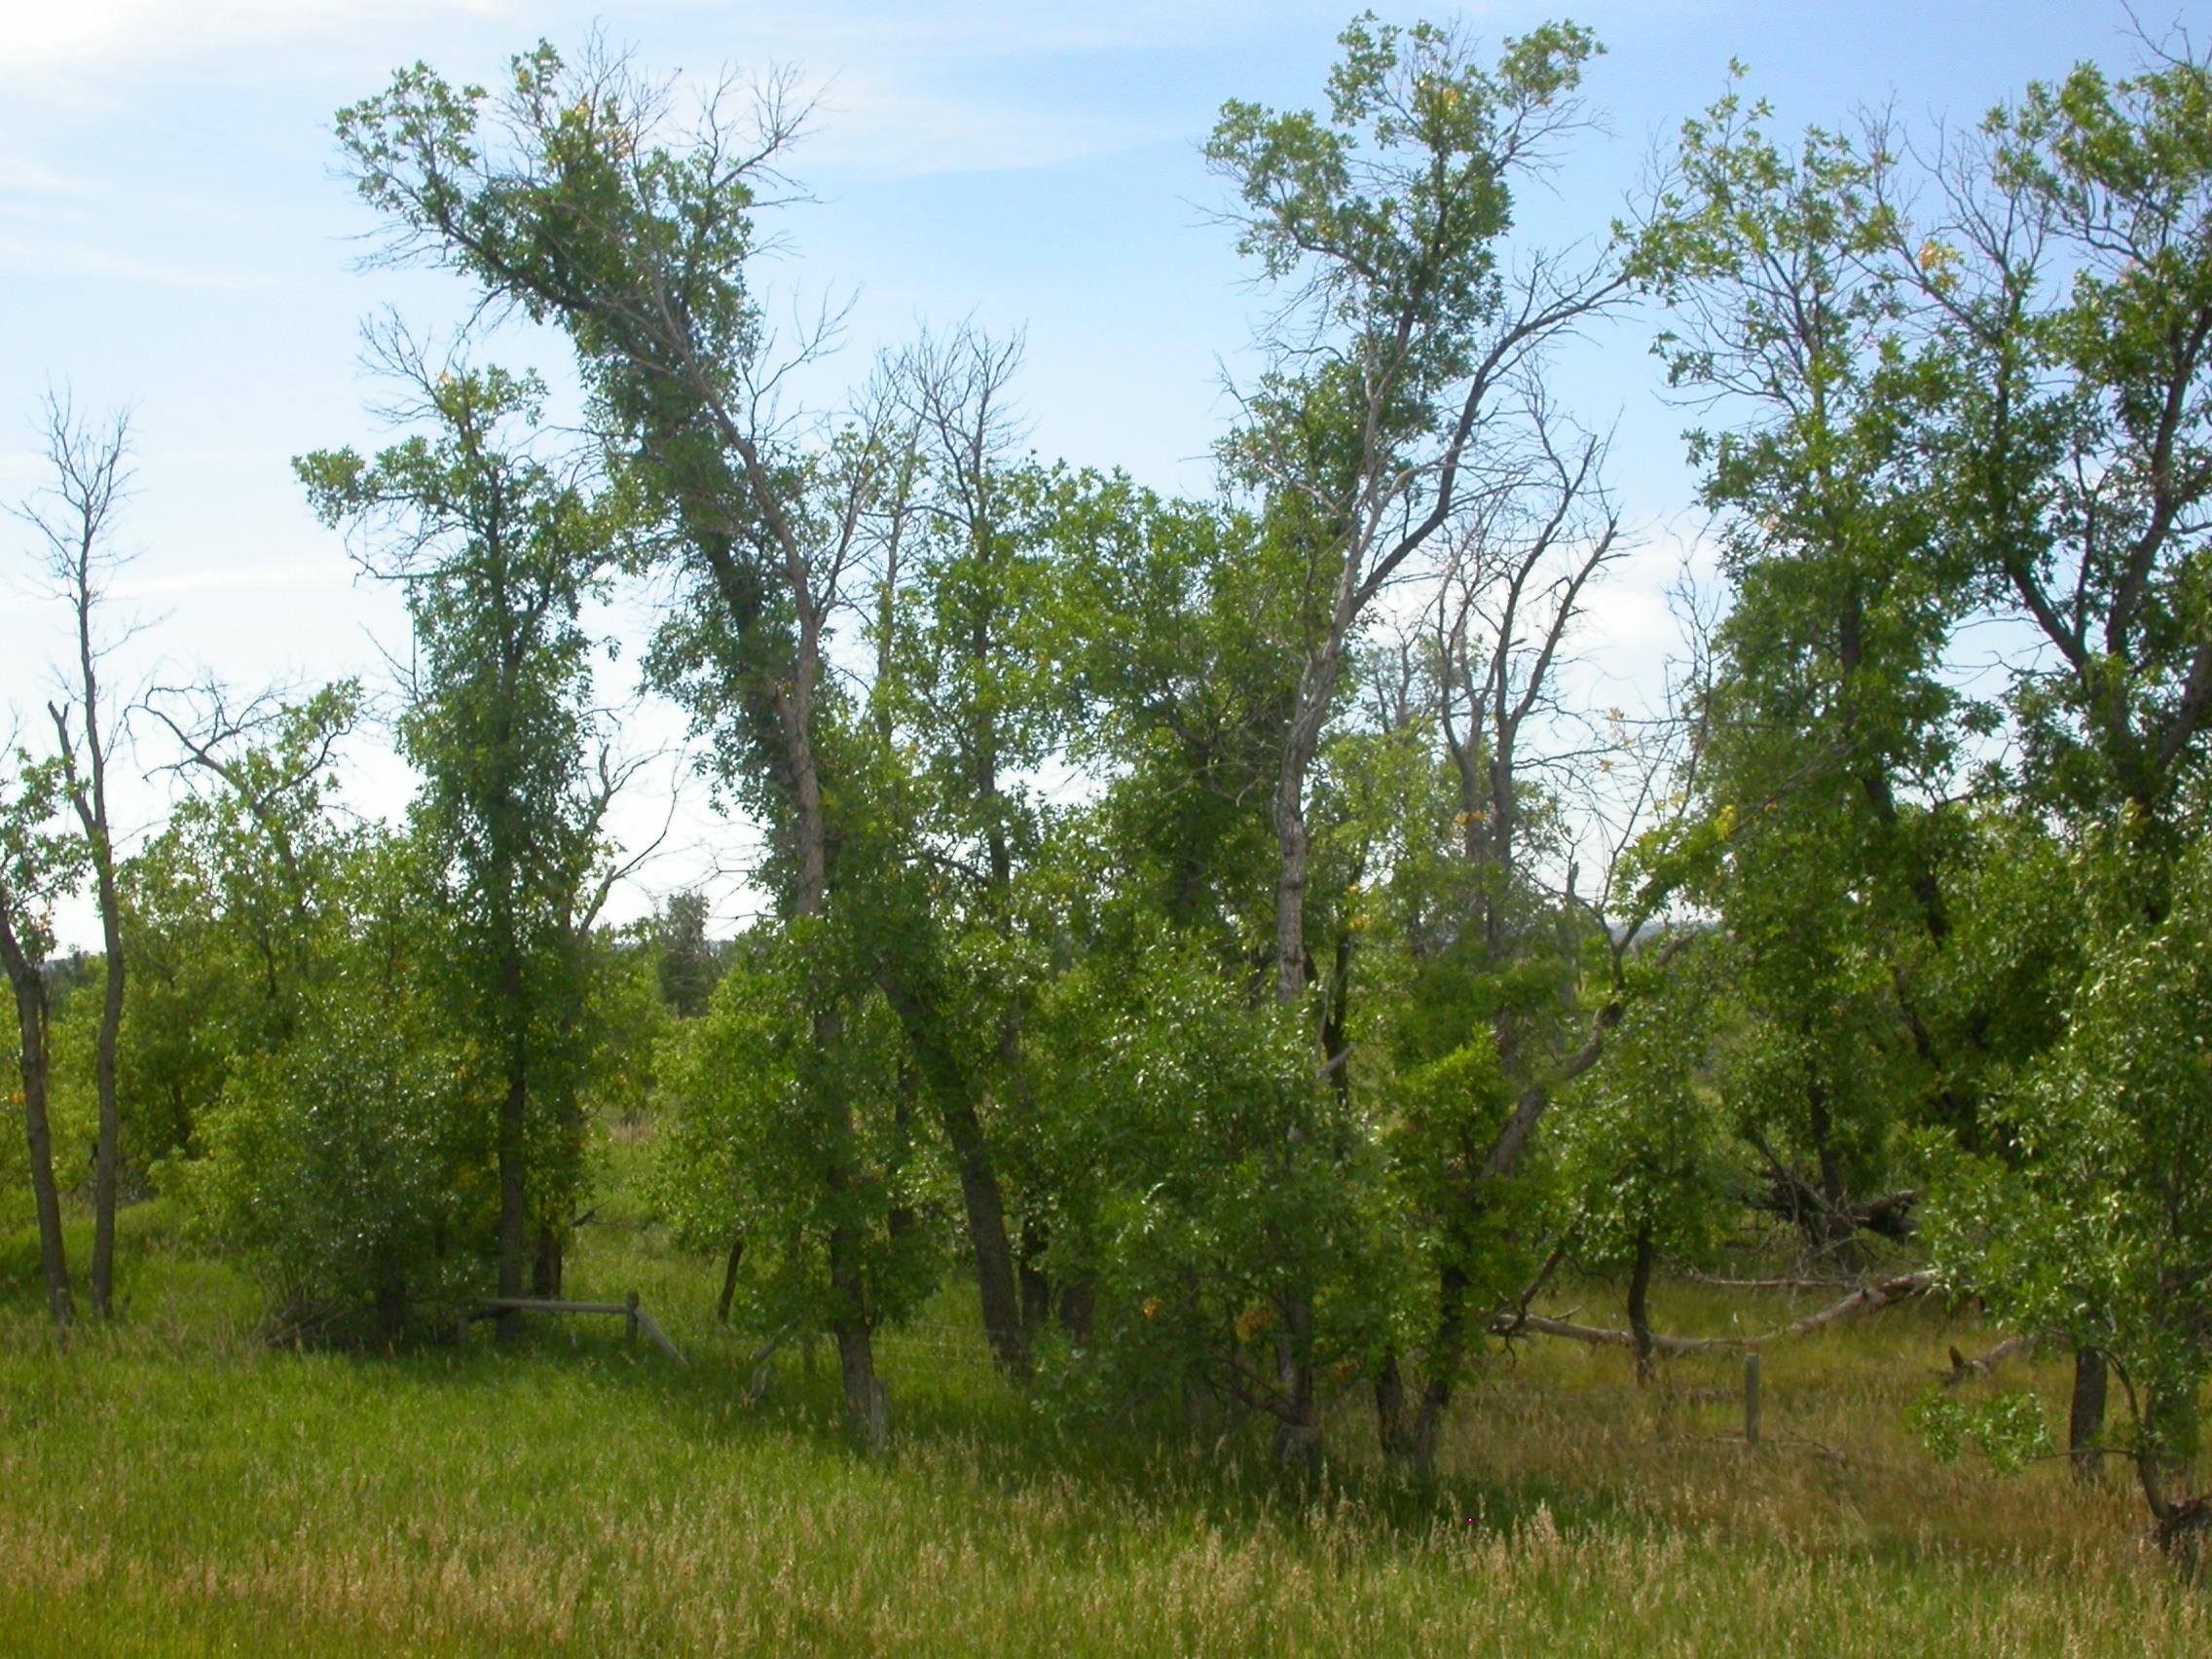 Image of green ash